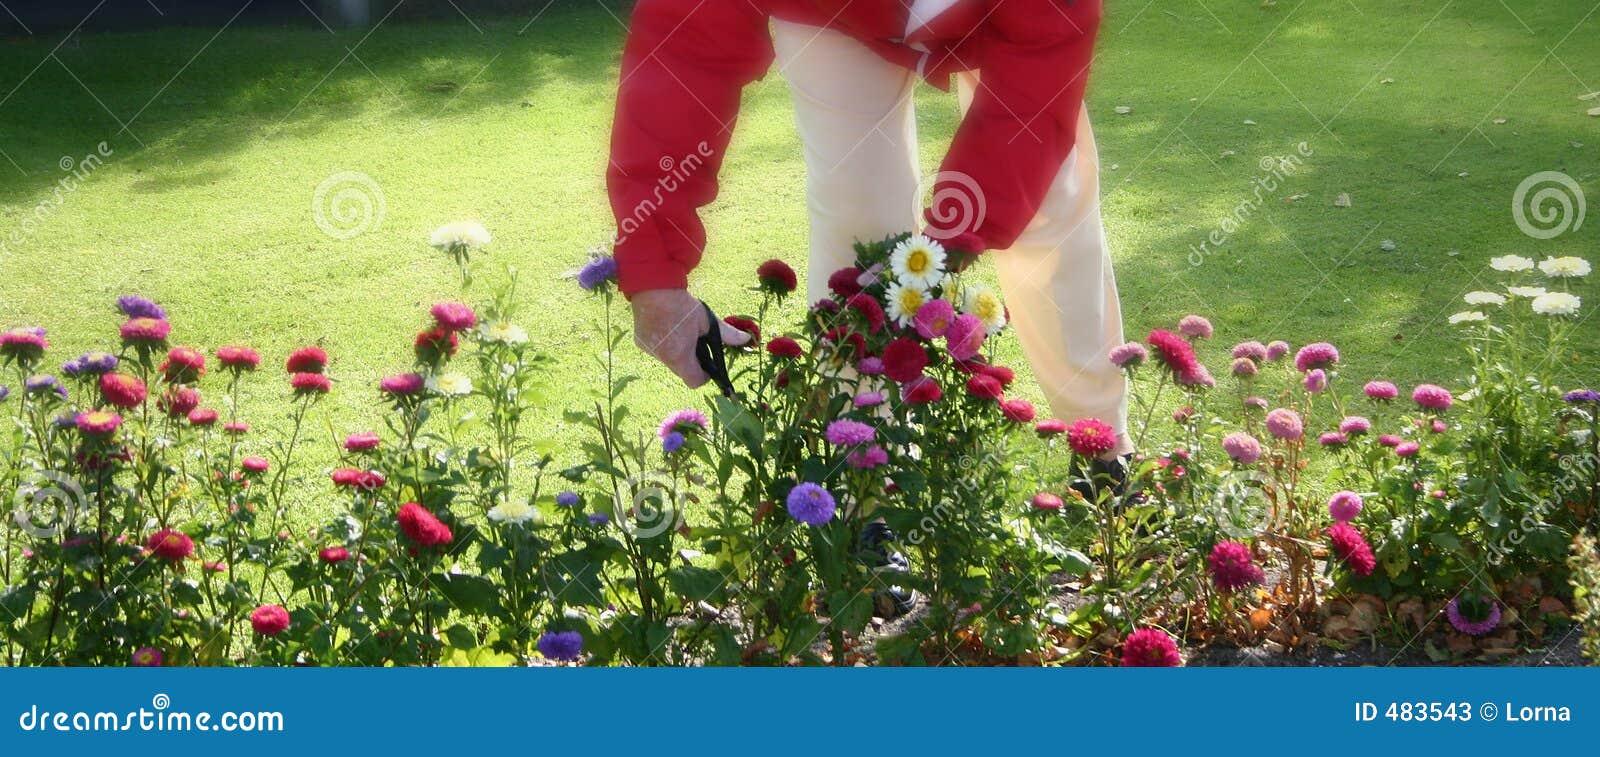 Flores de corte, cultivando un huerto